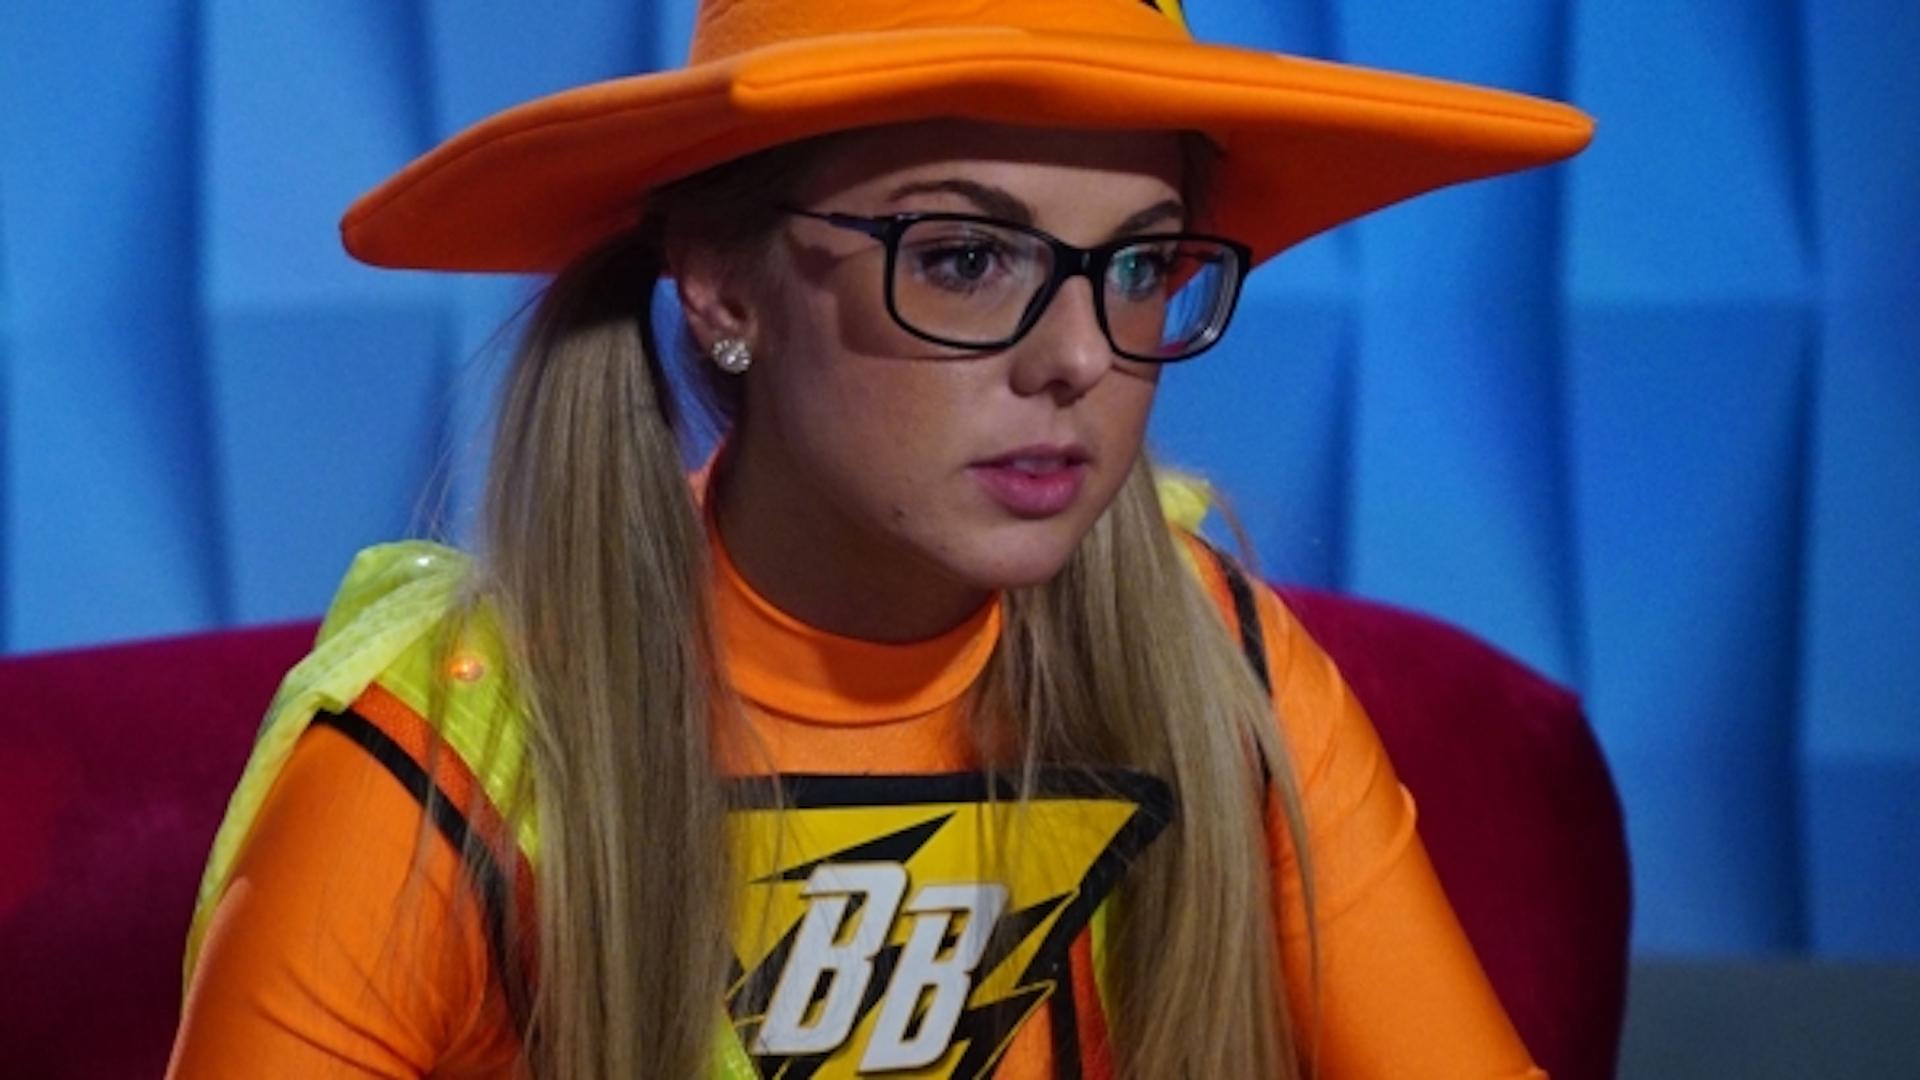 Nicole Franzel's Super Safety costume